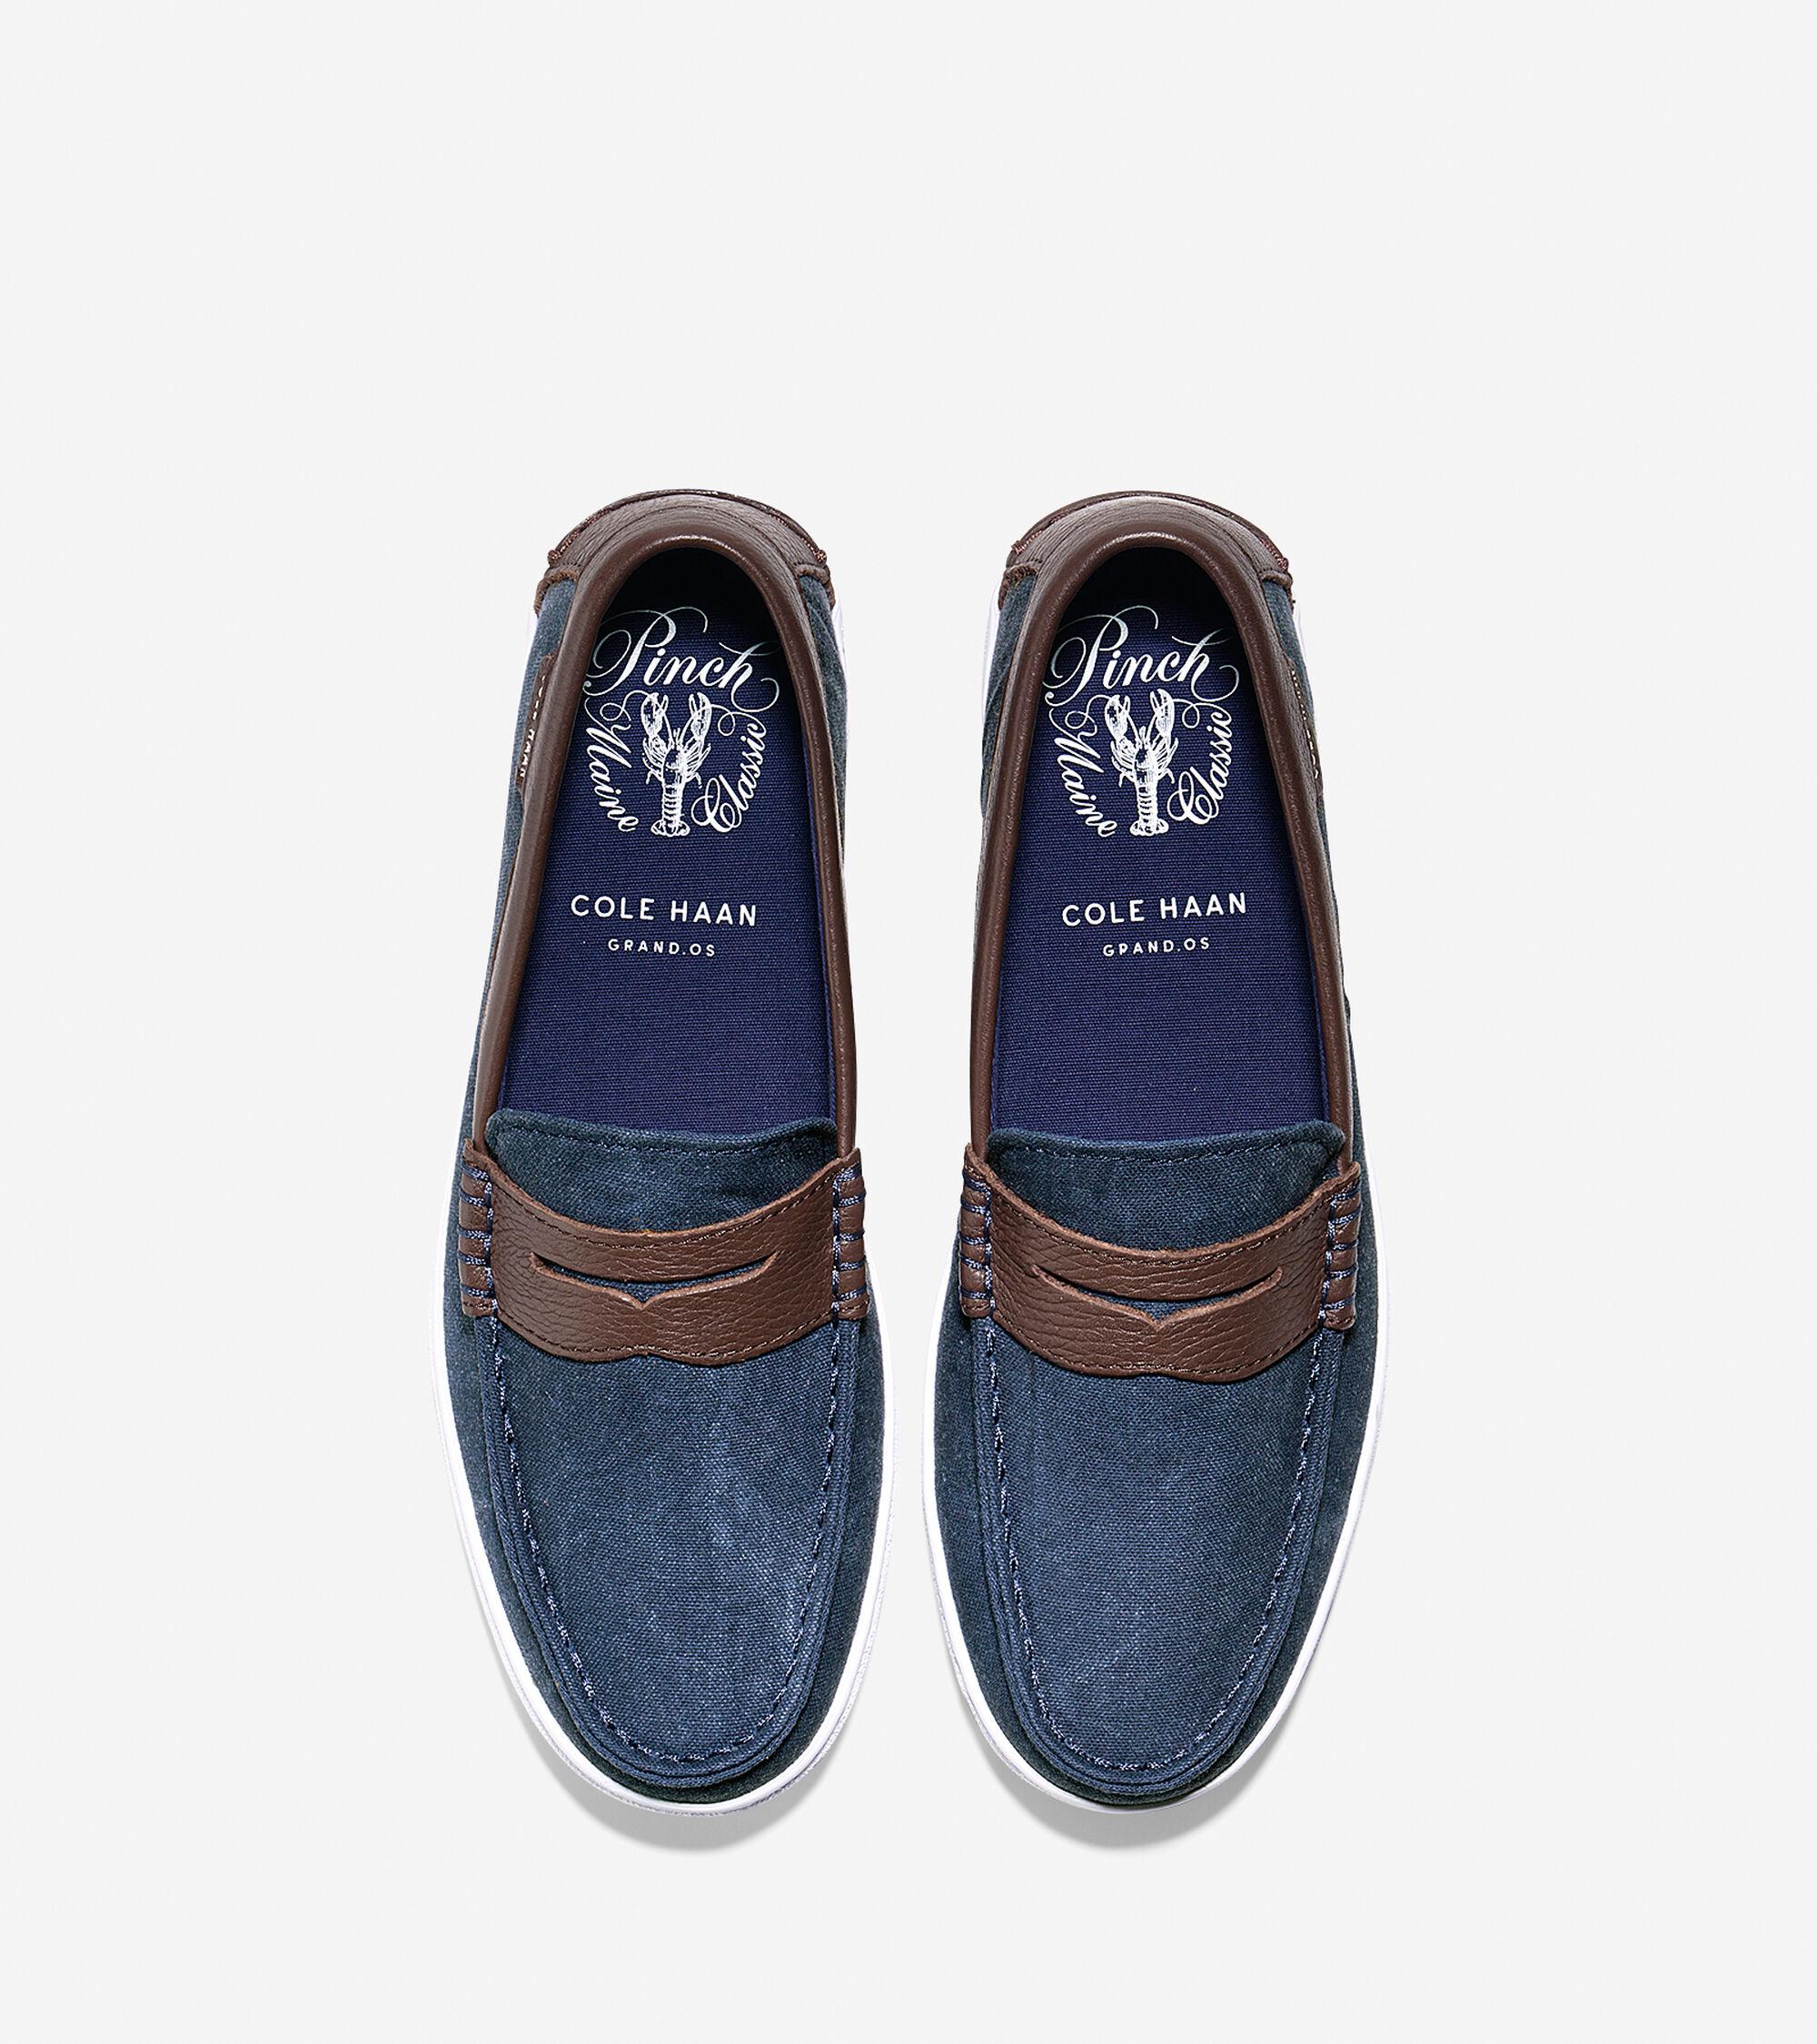 d1ce75bd7fa Mens Pinch Textile Weekenders in Blazer Blue-Chestnut Textile